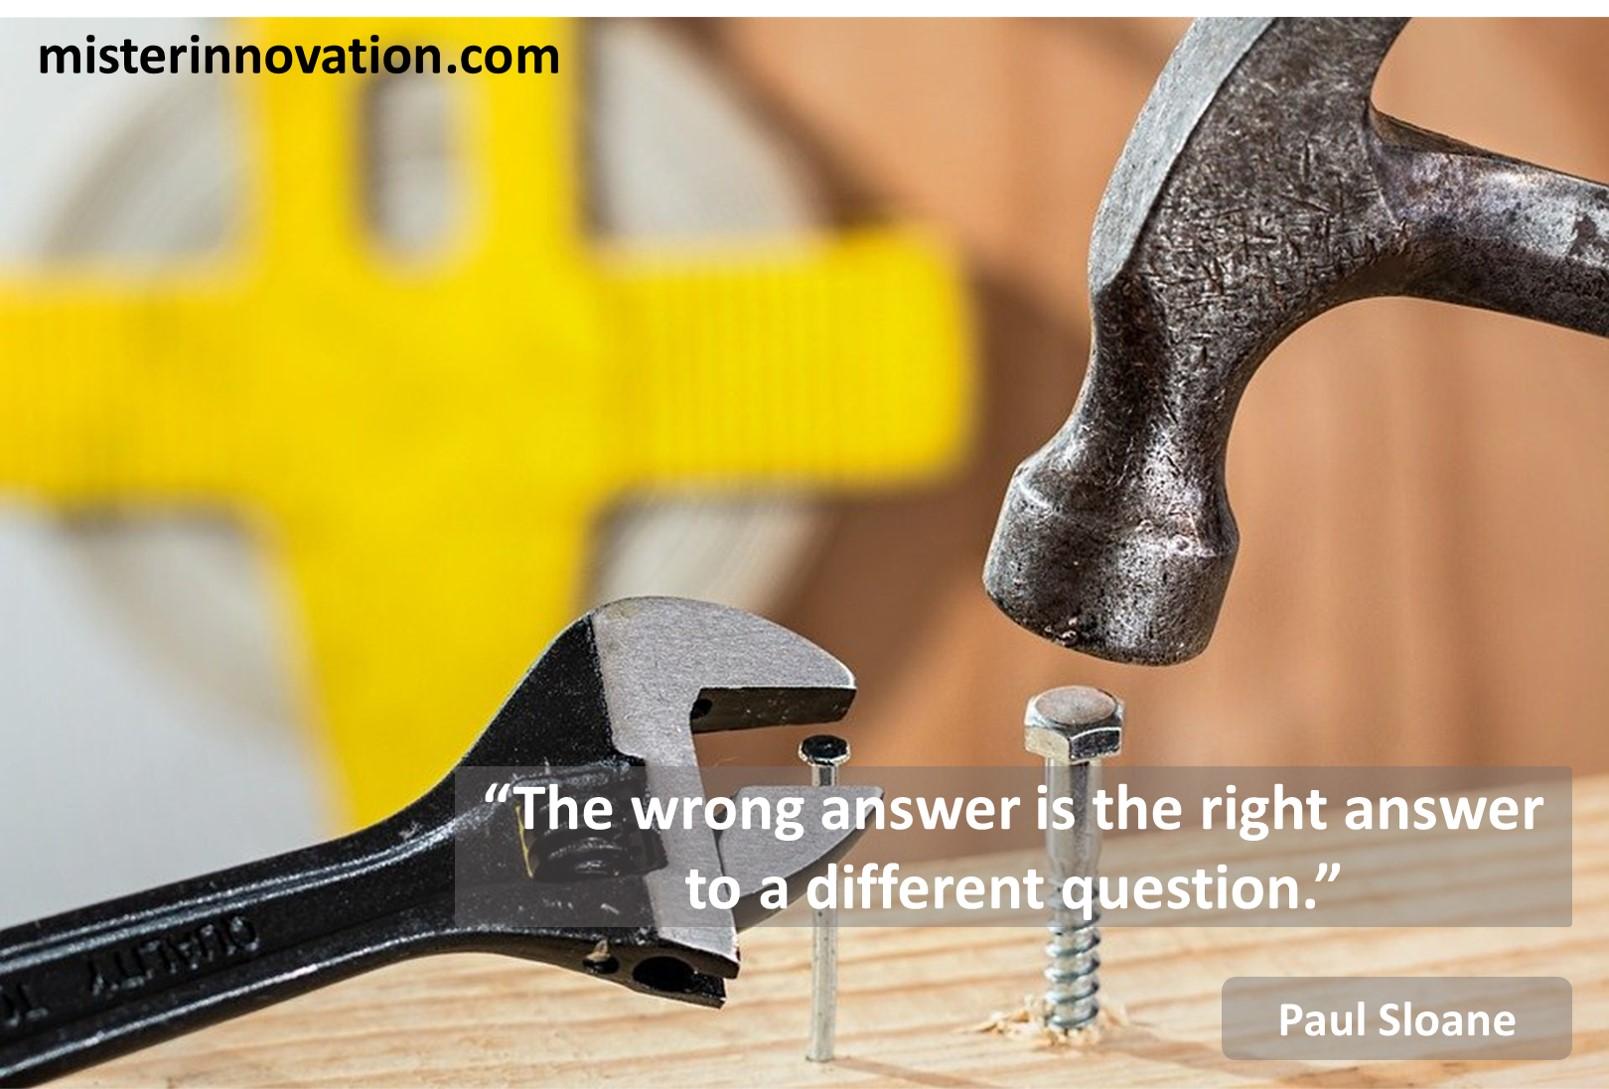 Paul Sloane Wrong Answer